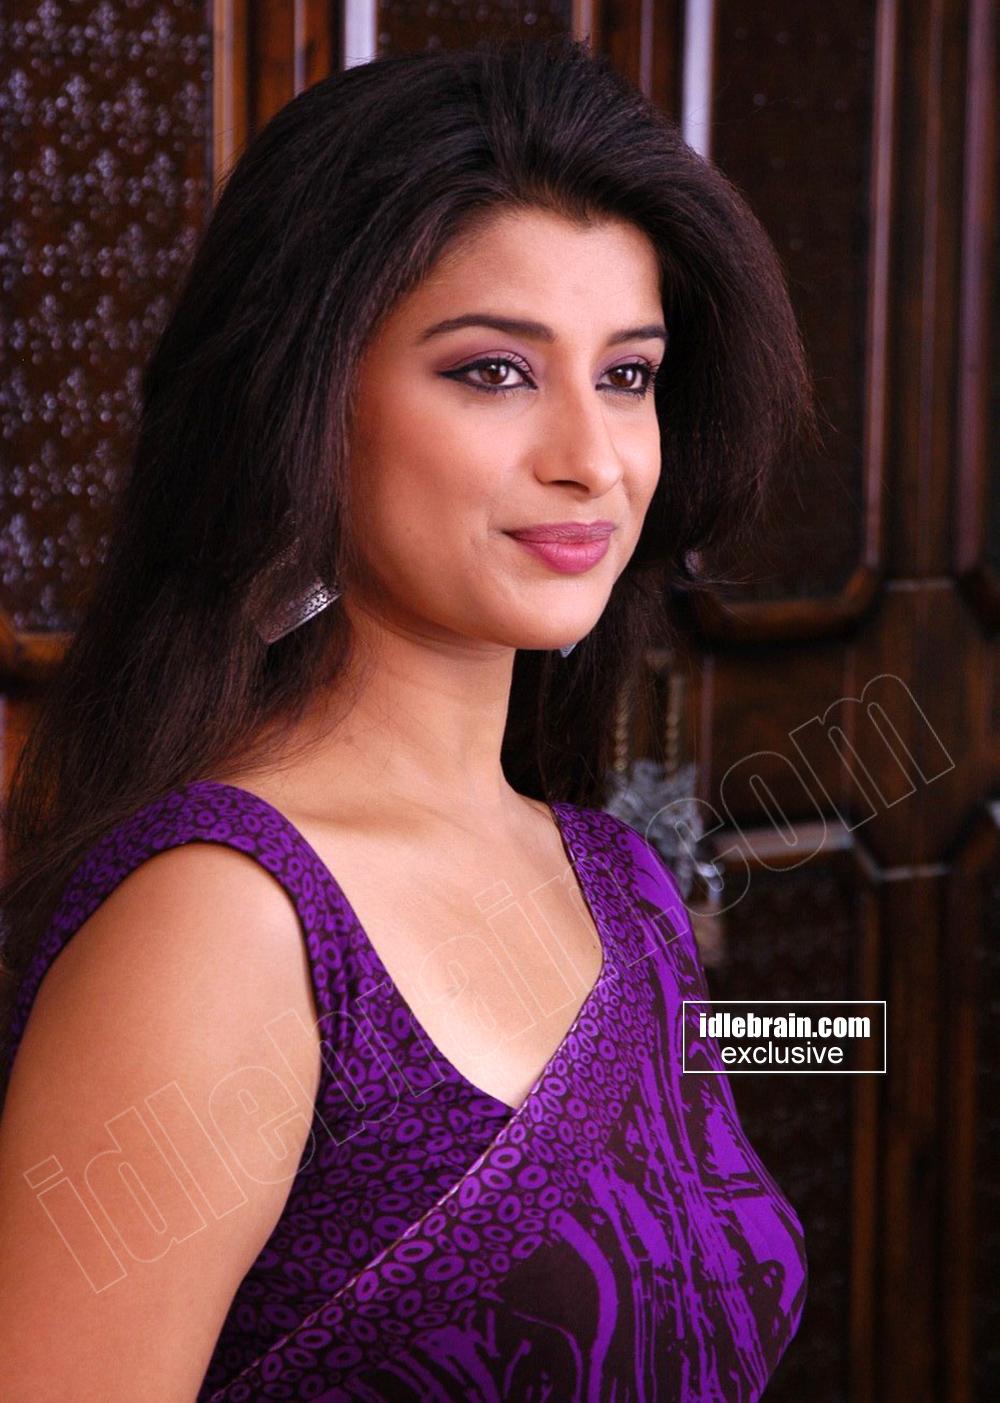 madhurima hot and cute saree pics